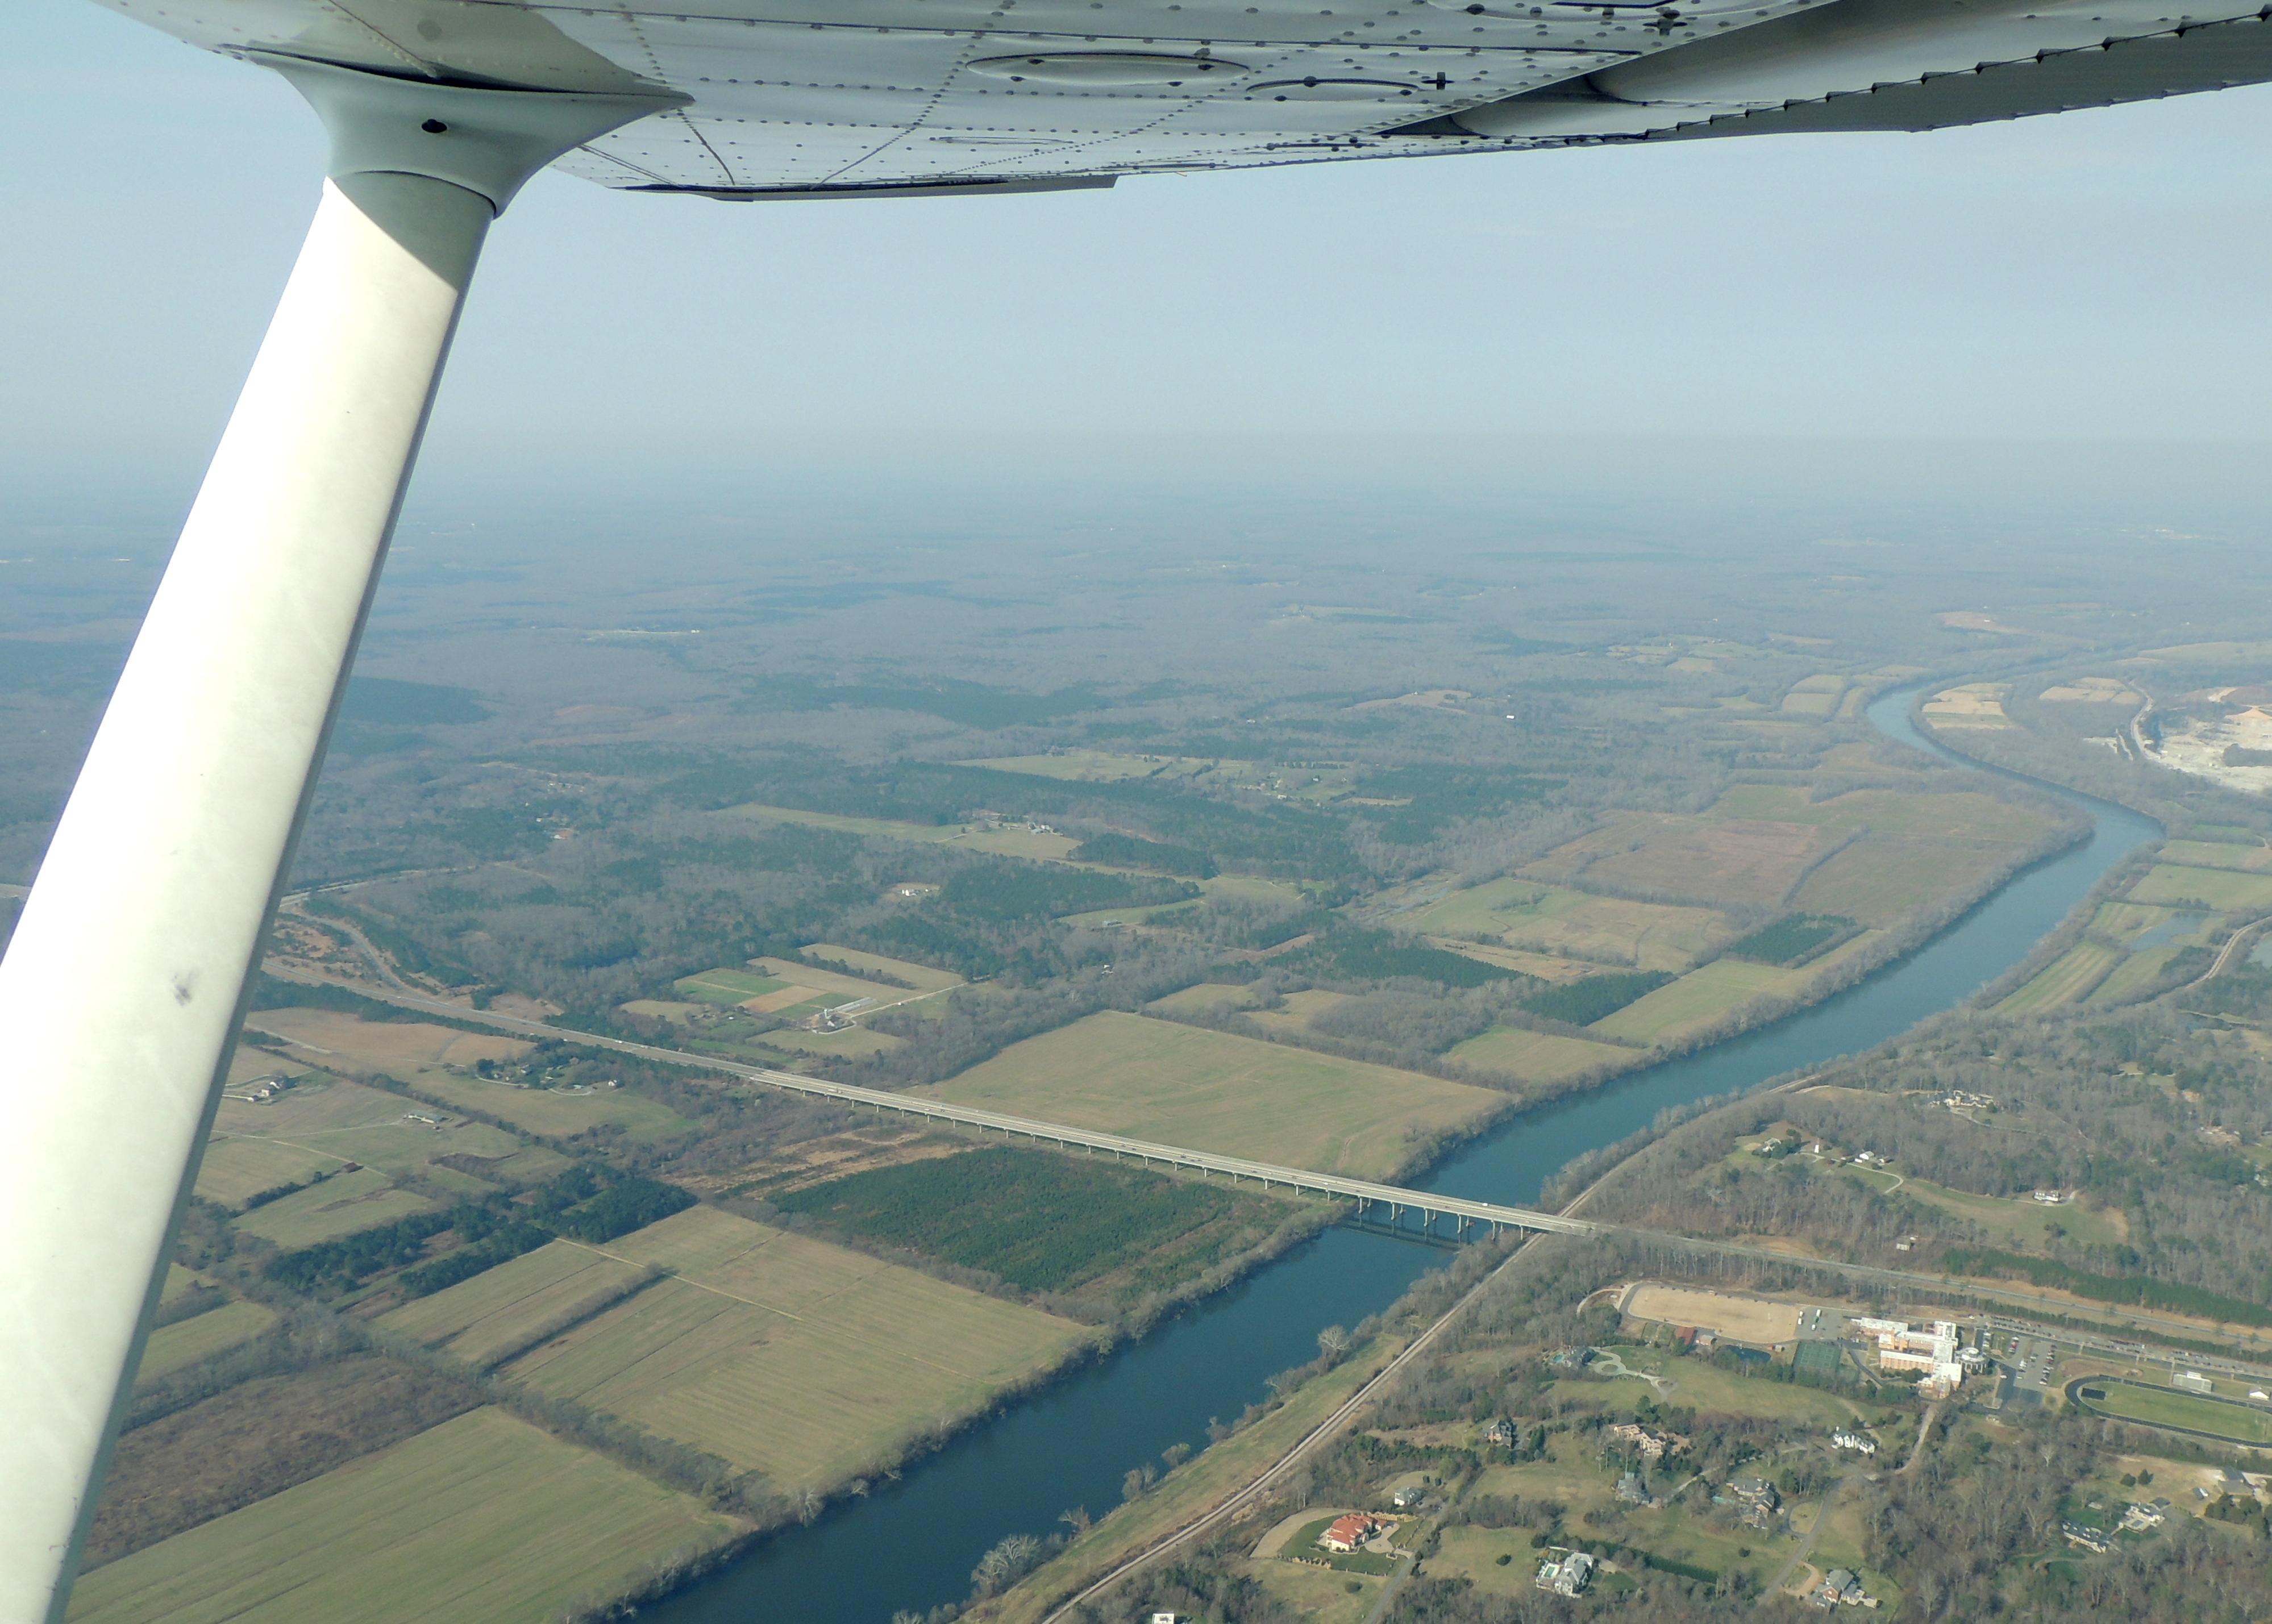 Over the James River near Richmond Va